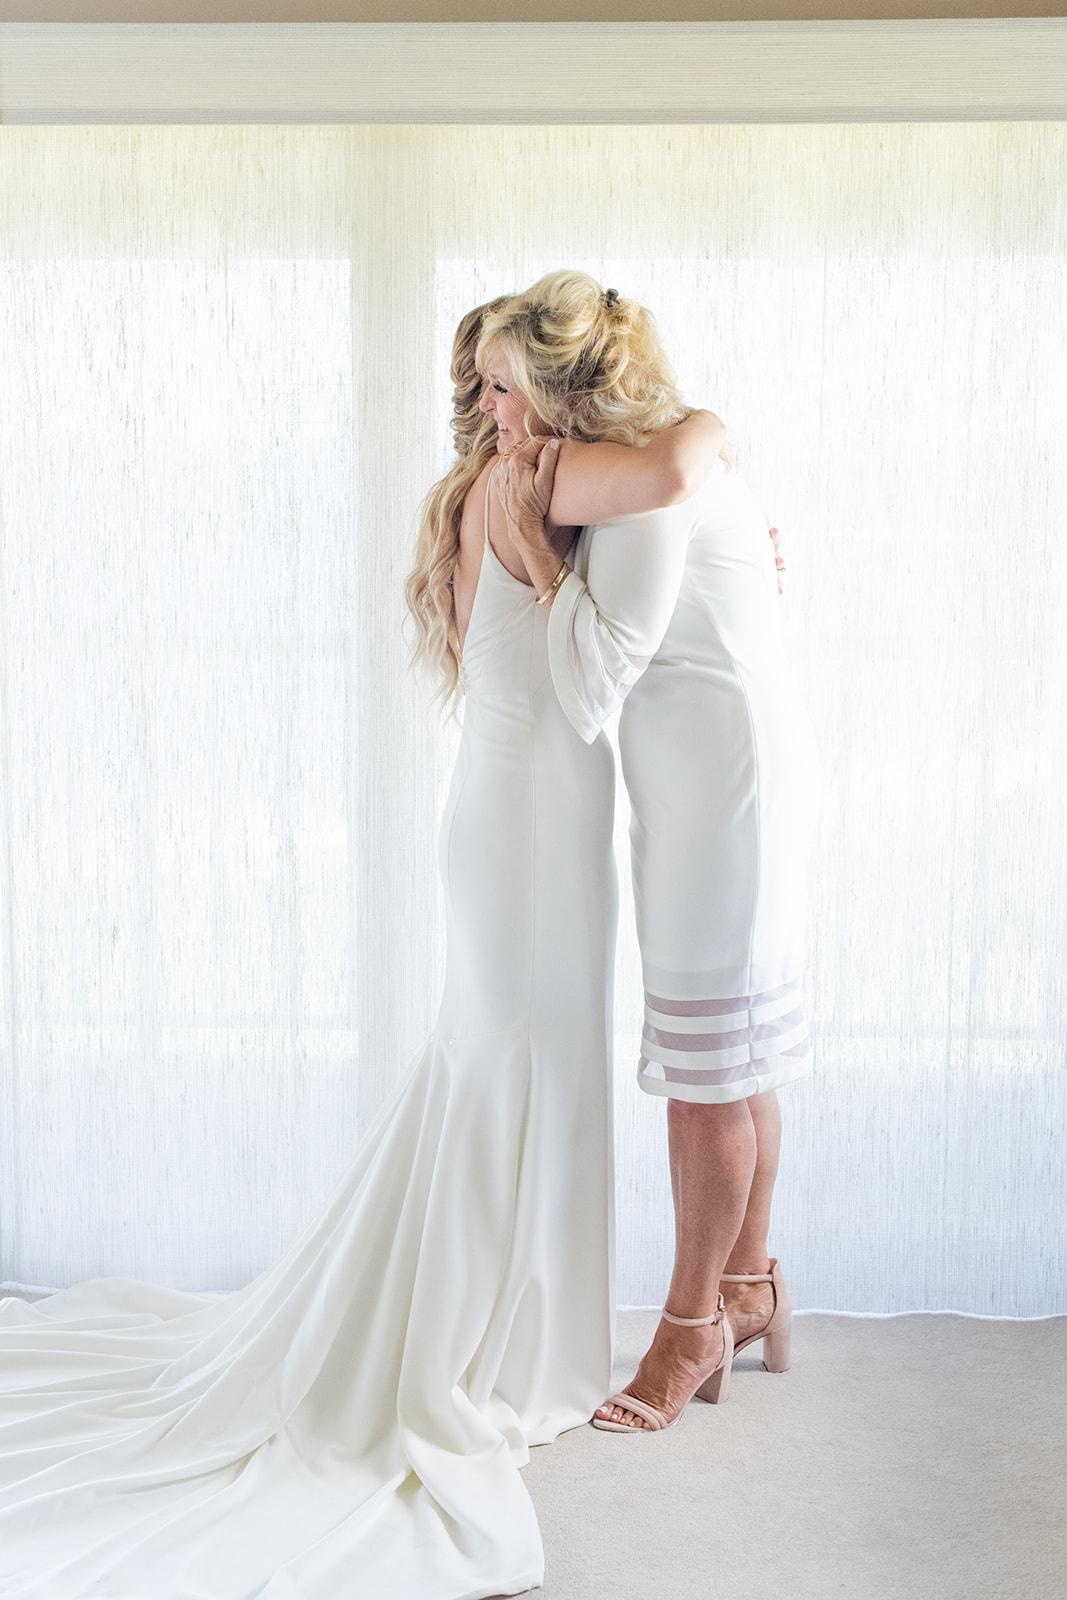 mother daughter wedding day spokane bride